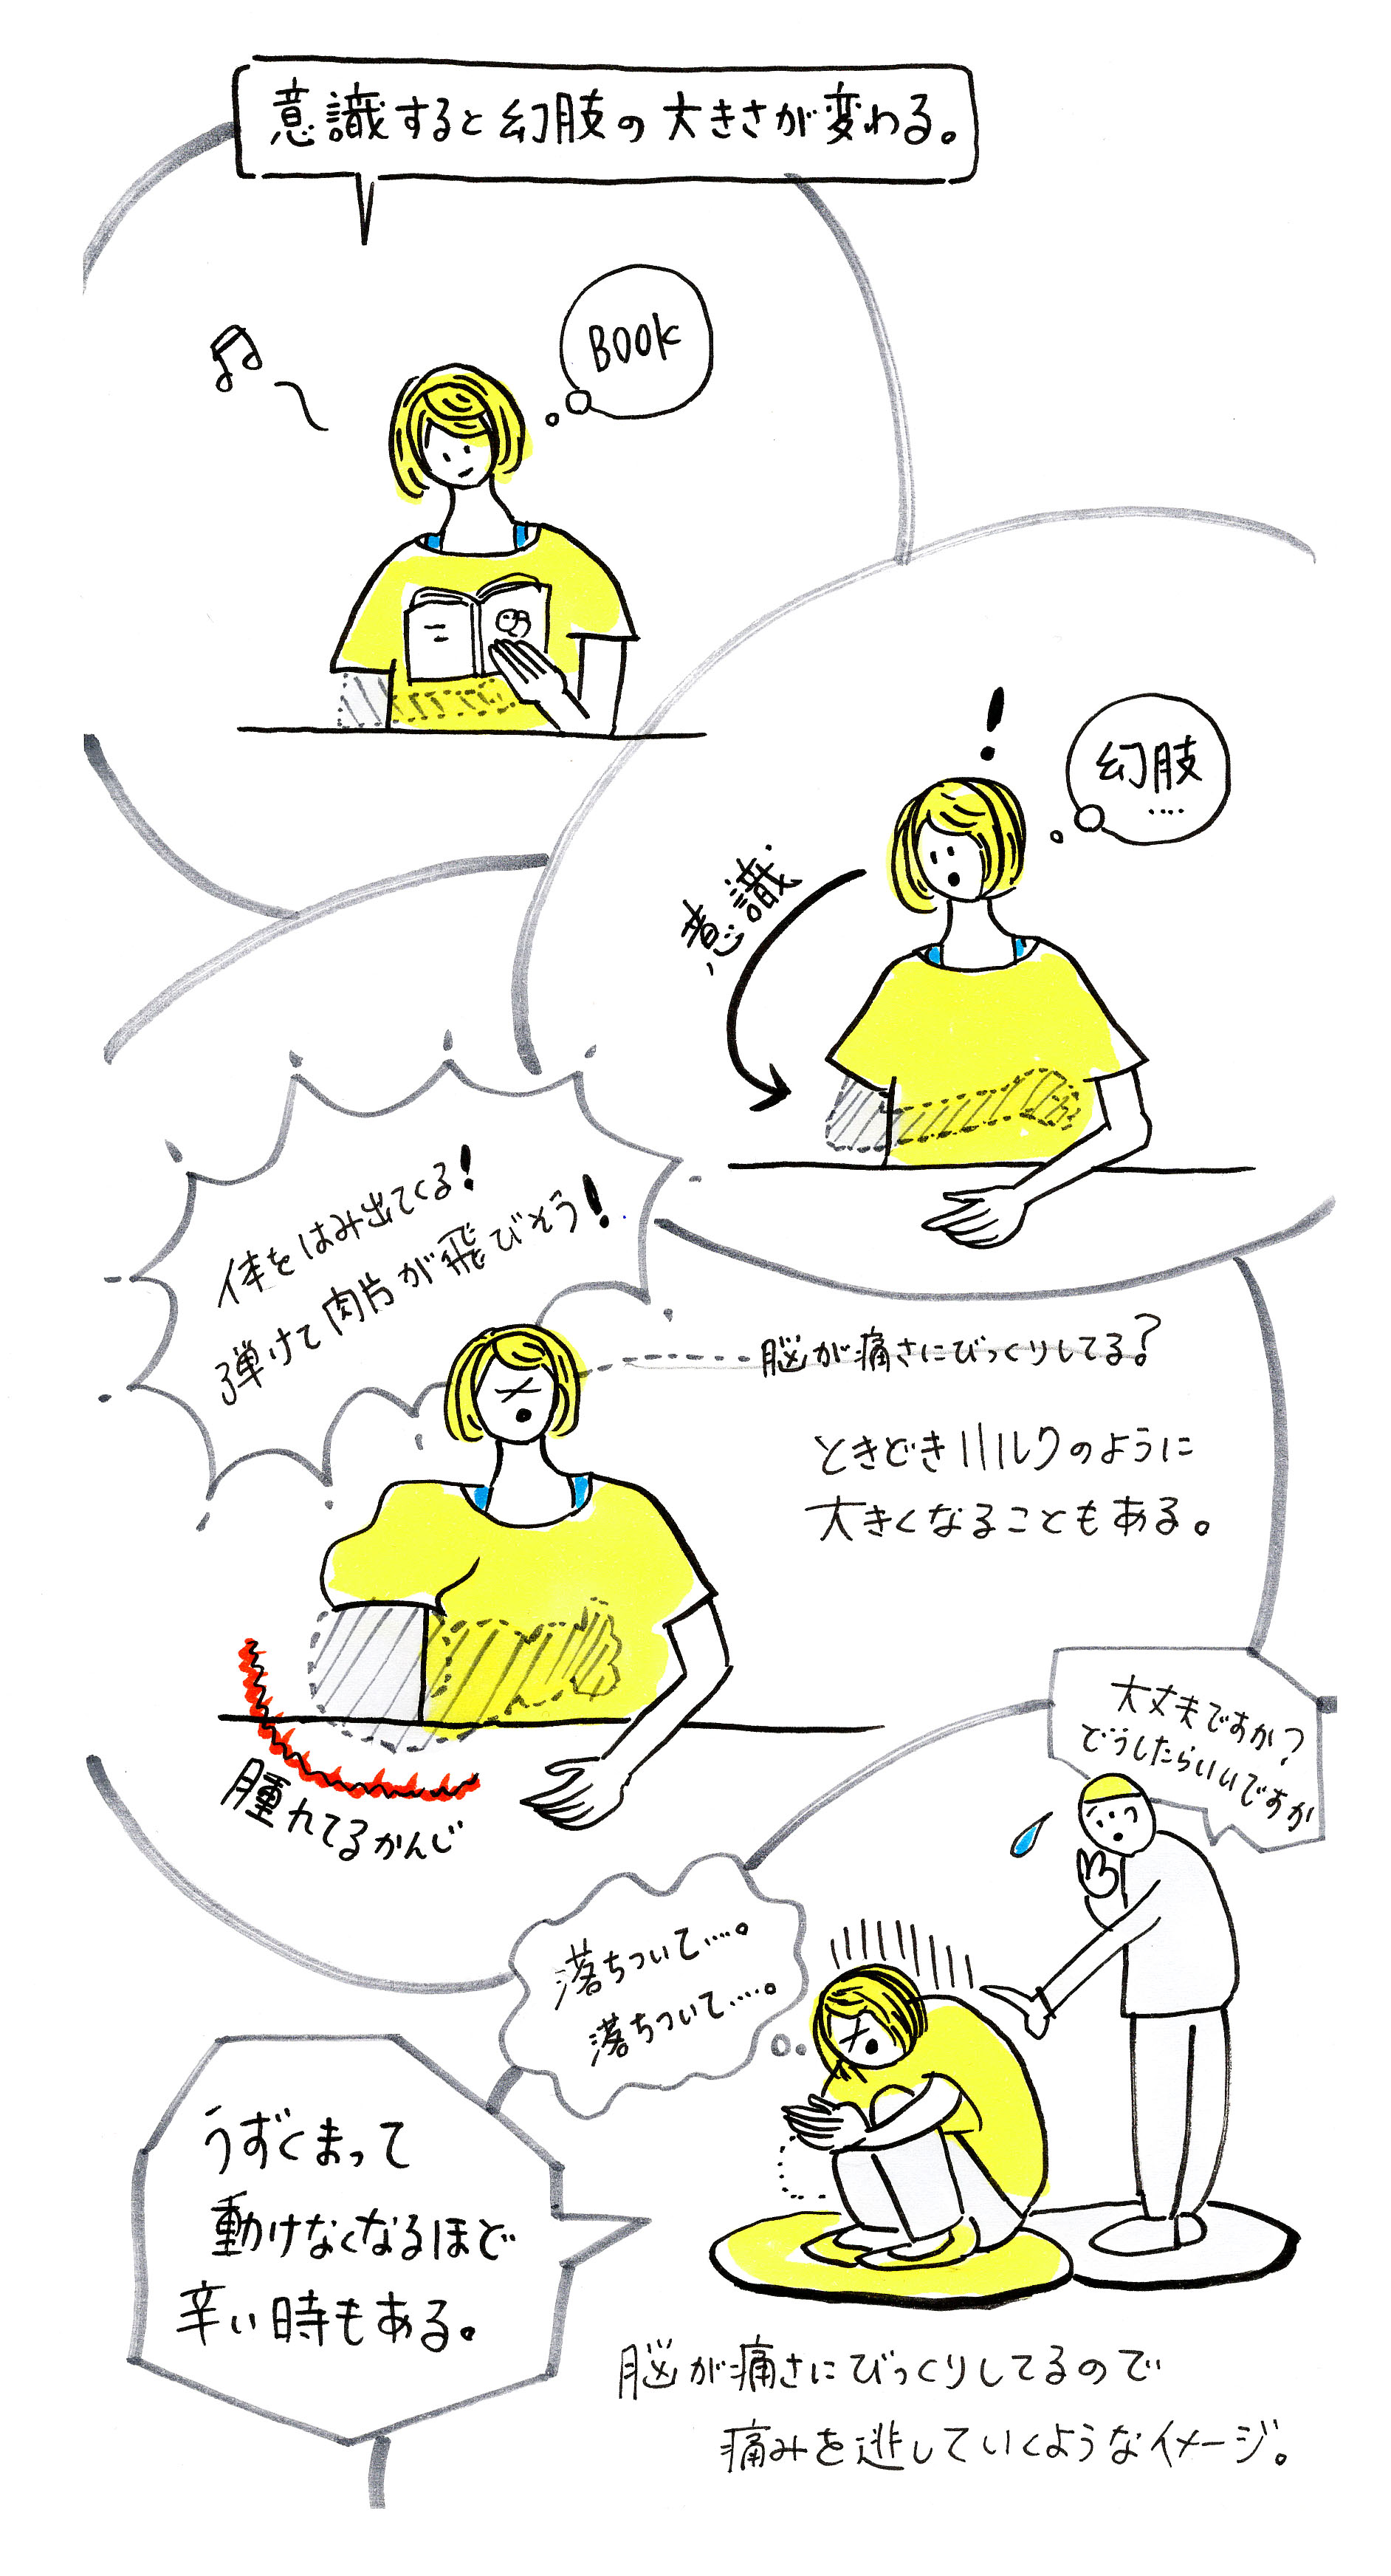 【TBS金22】金曜ドラマ『インハンド』避難所 YouTube動画>3本 ->画像>38枚